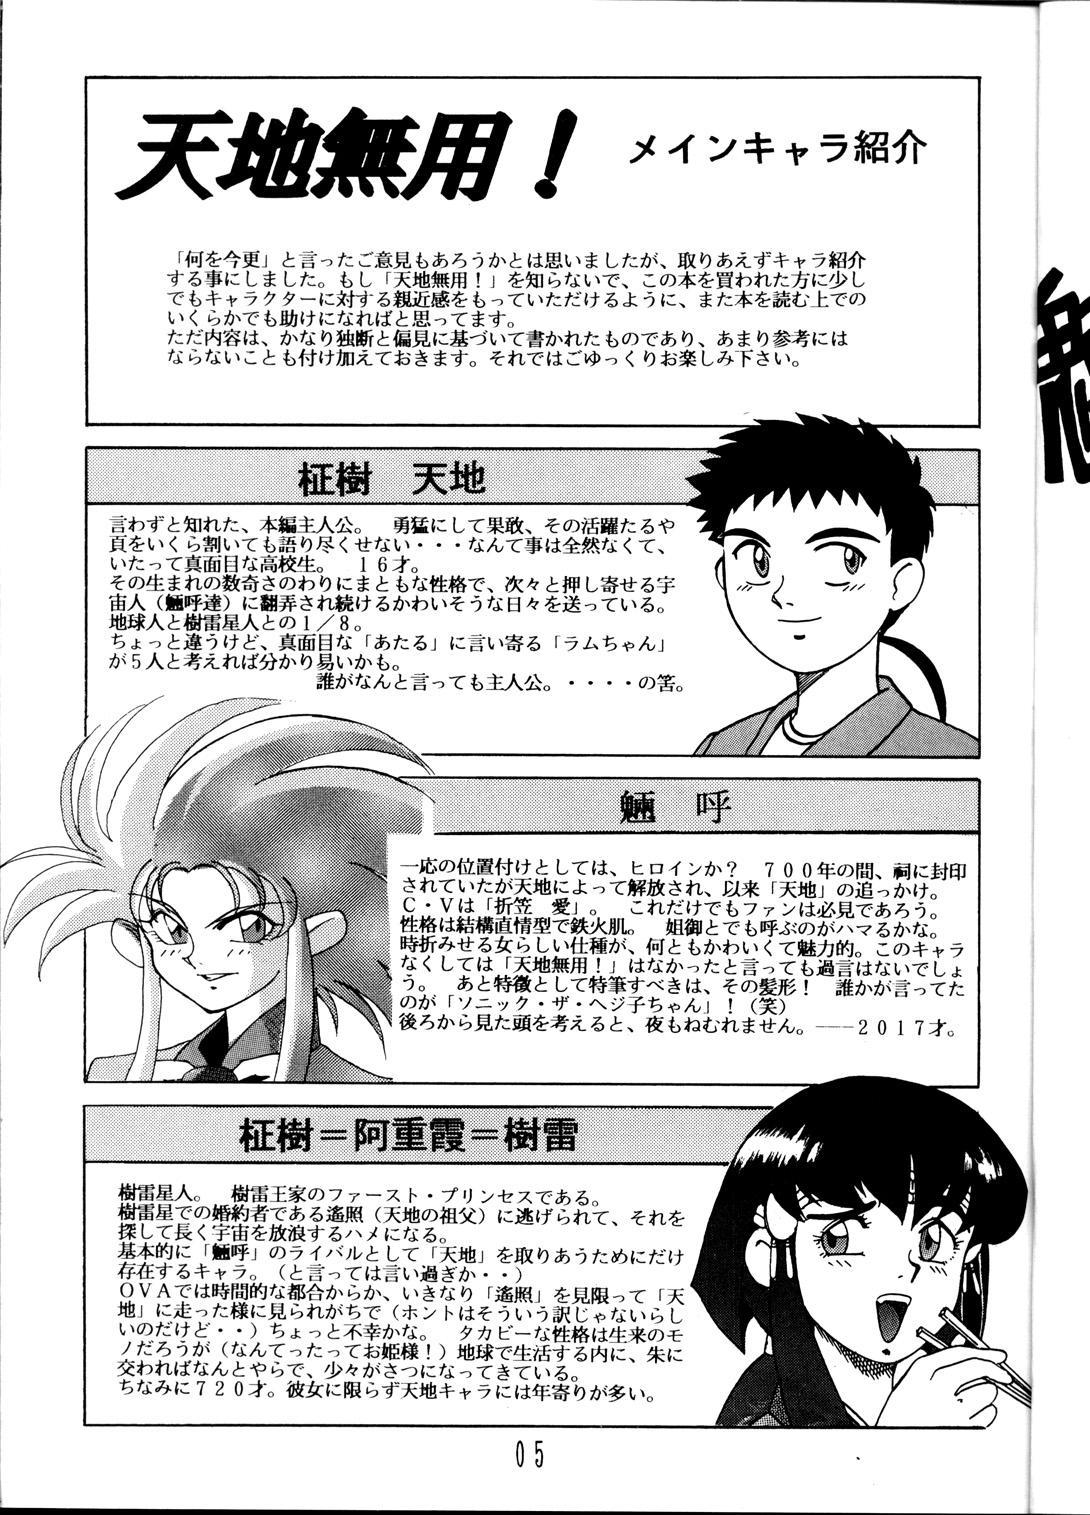 Tenchi Muyou! Sample Vol 6 3